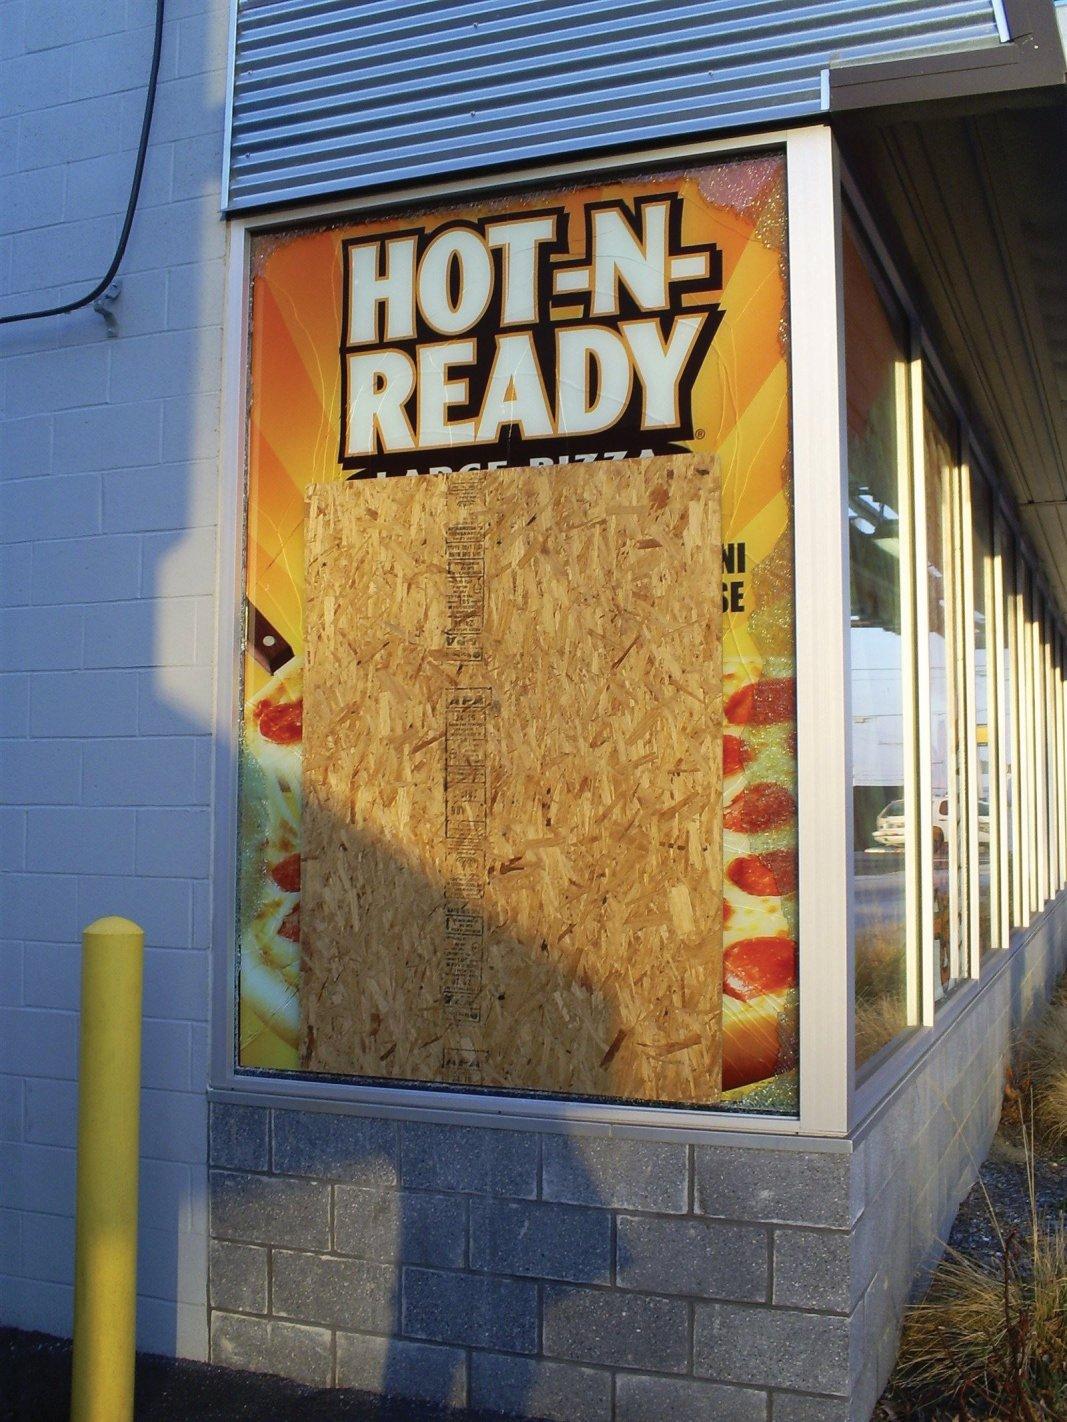 Broken window repair in Philadelphia Pa